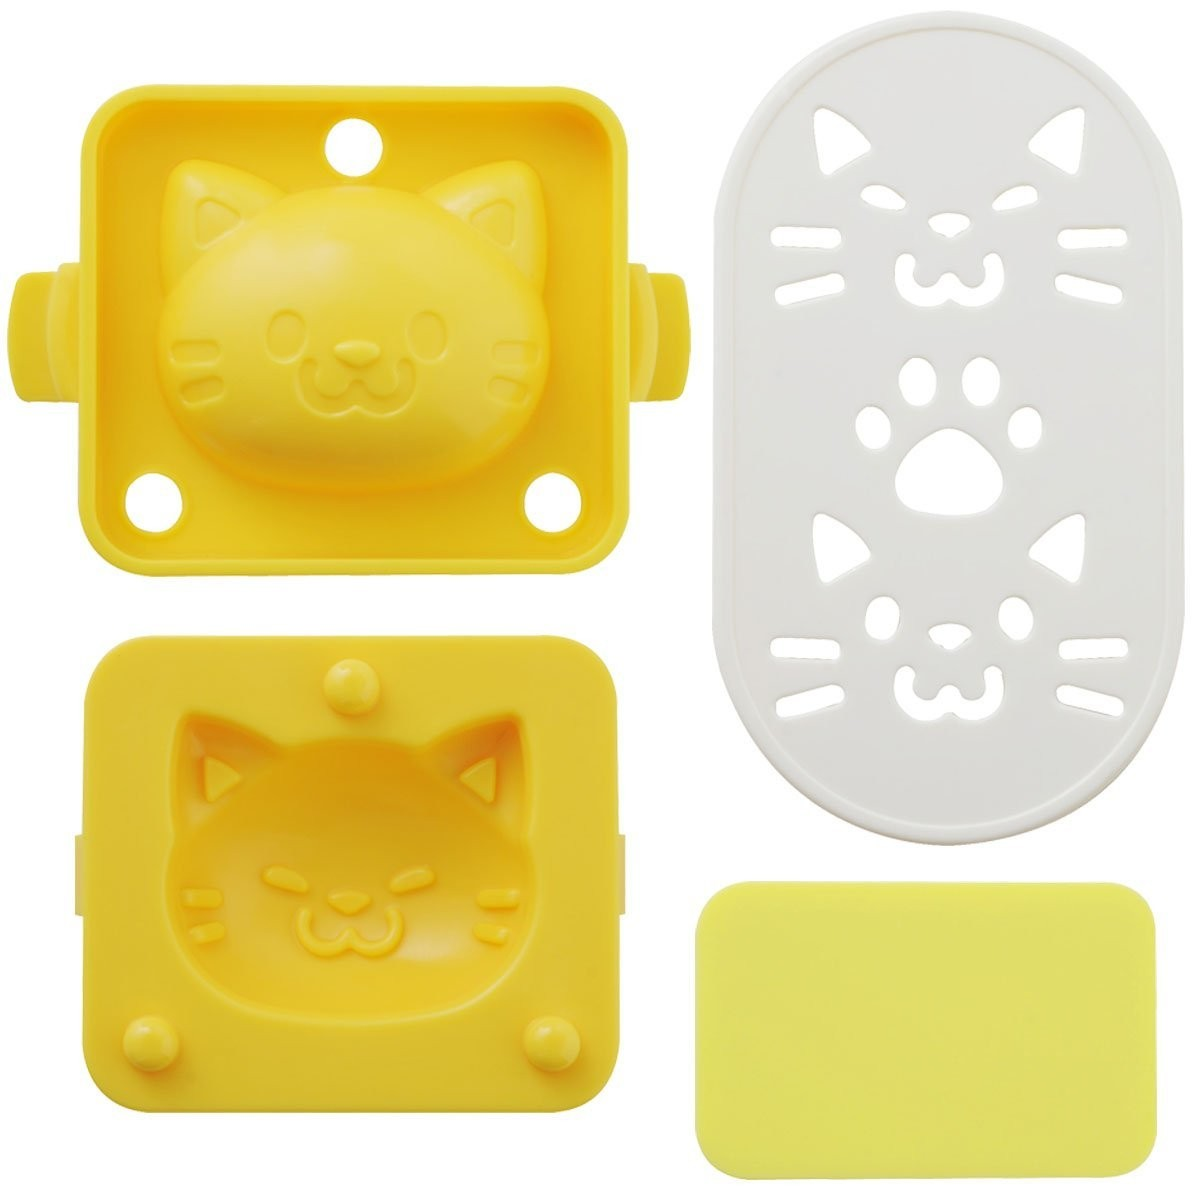 egg mold set with seaweed cutter cat shape for egg mold rice mold. Black Bedroom Furniture Sets. Home Design Ideas